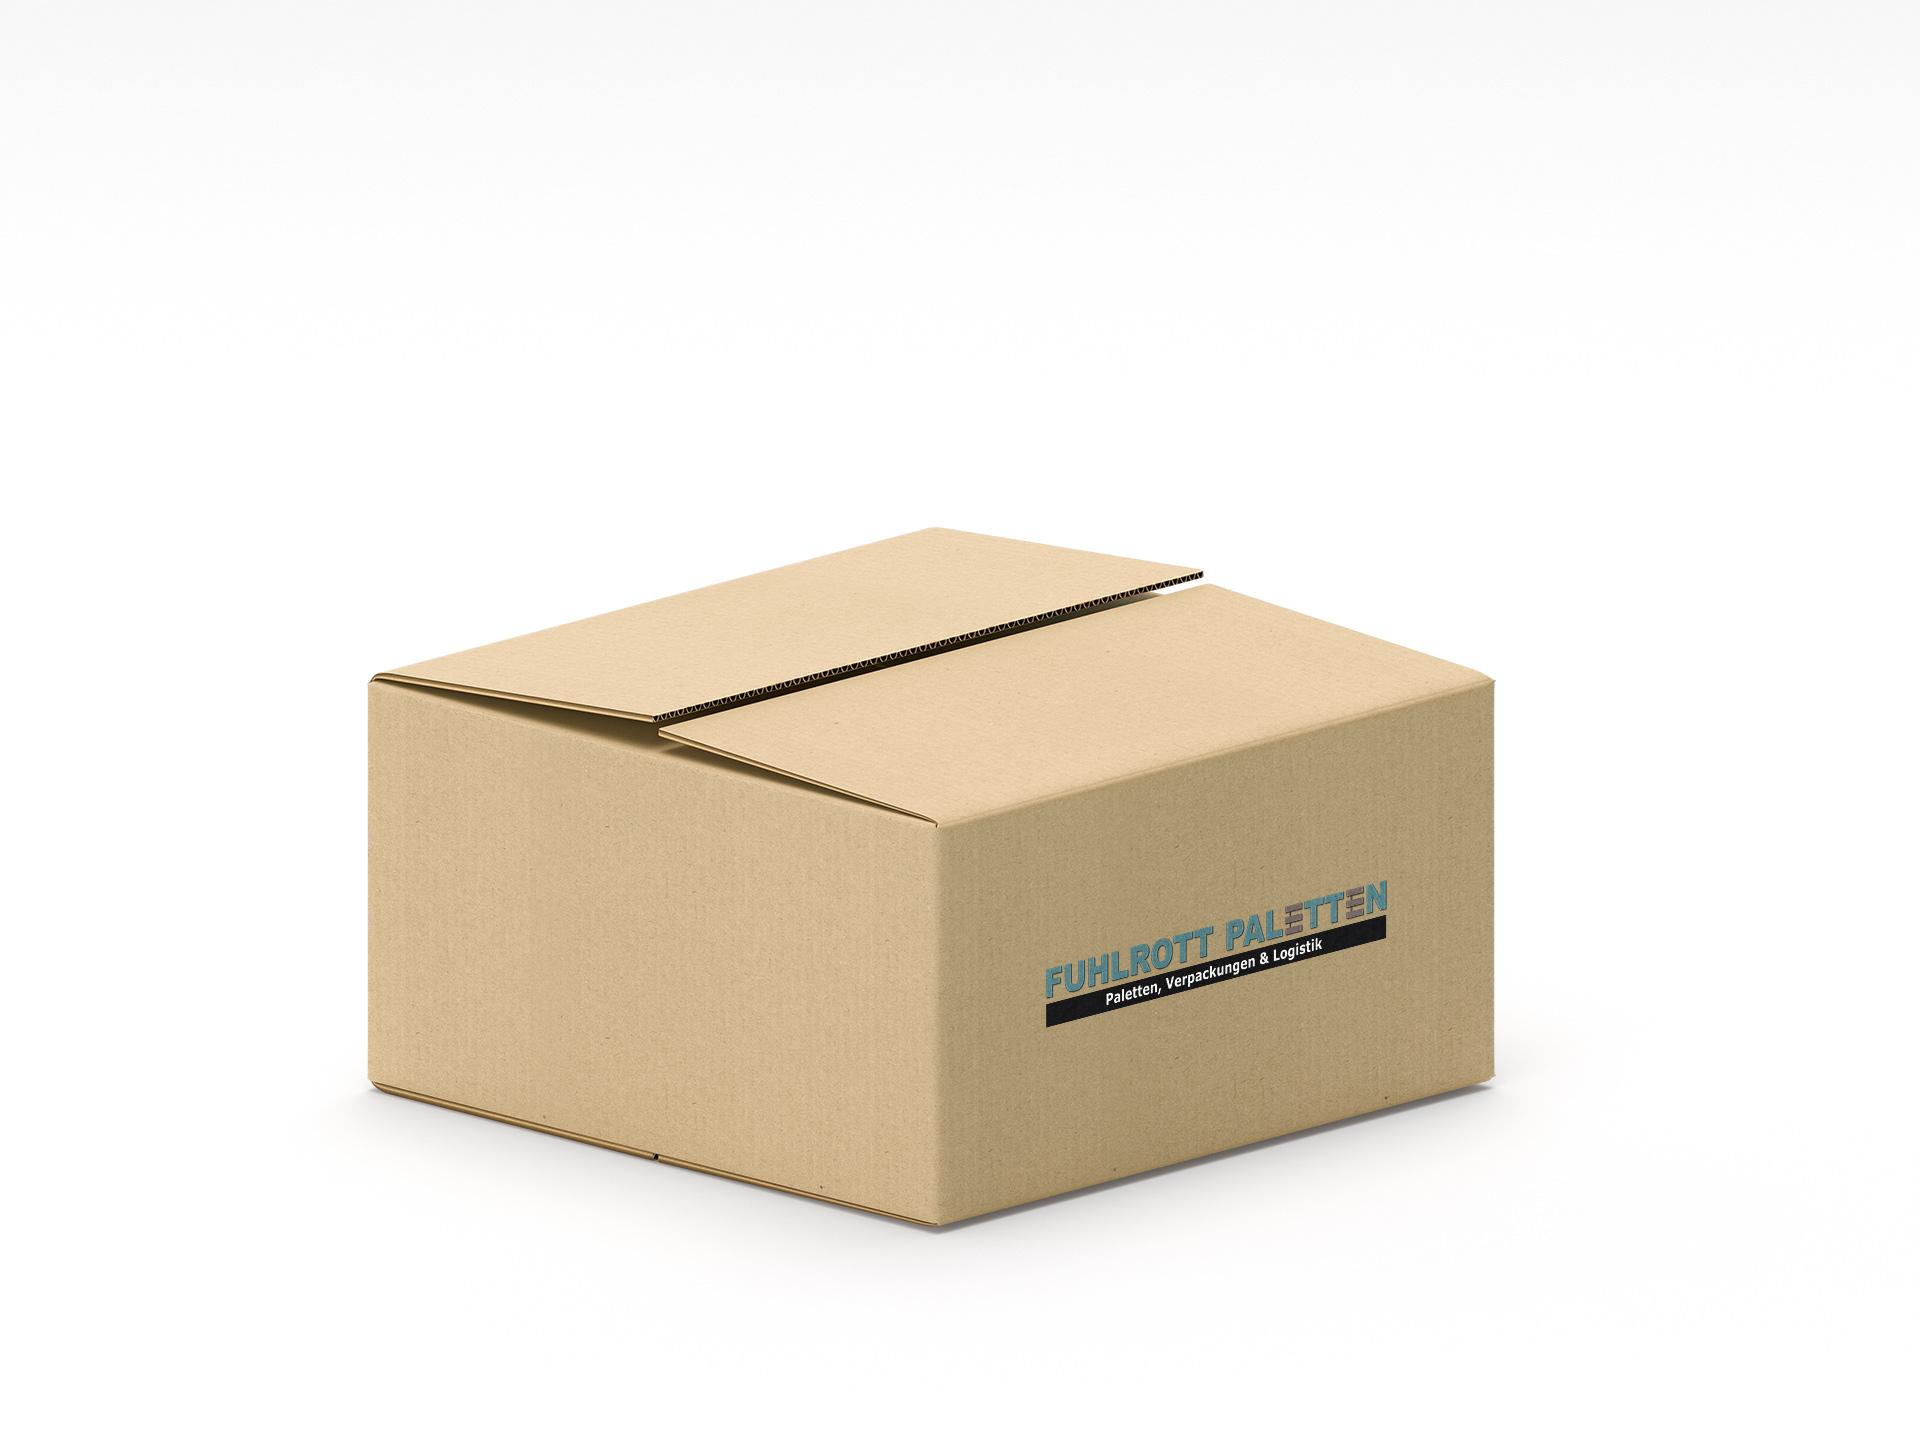 Karton Wellpappverpackung